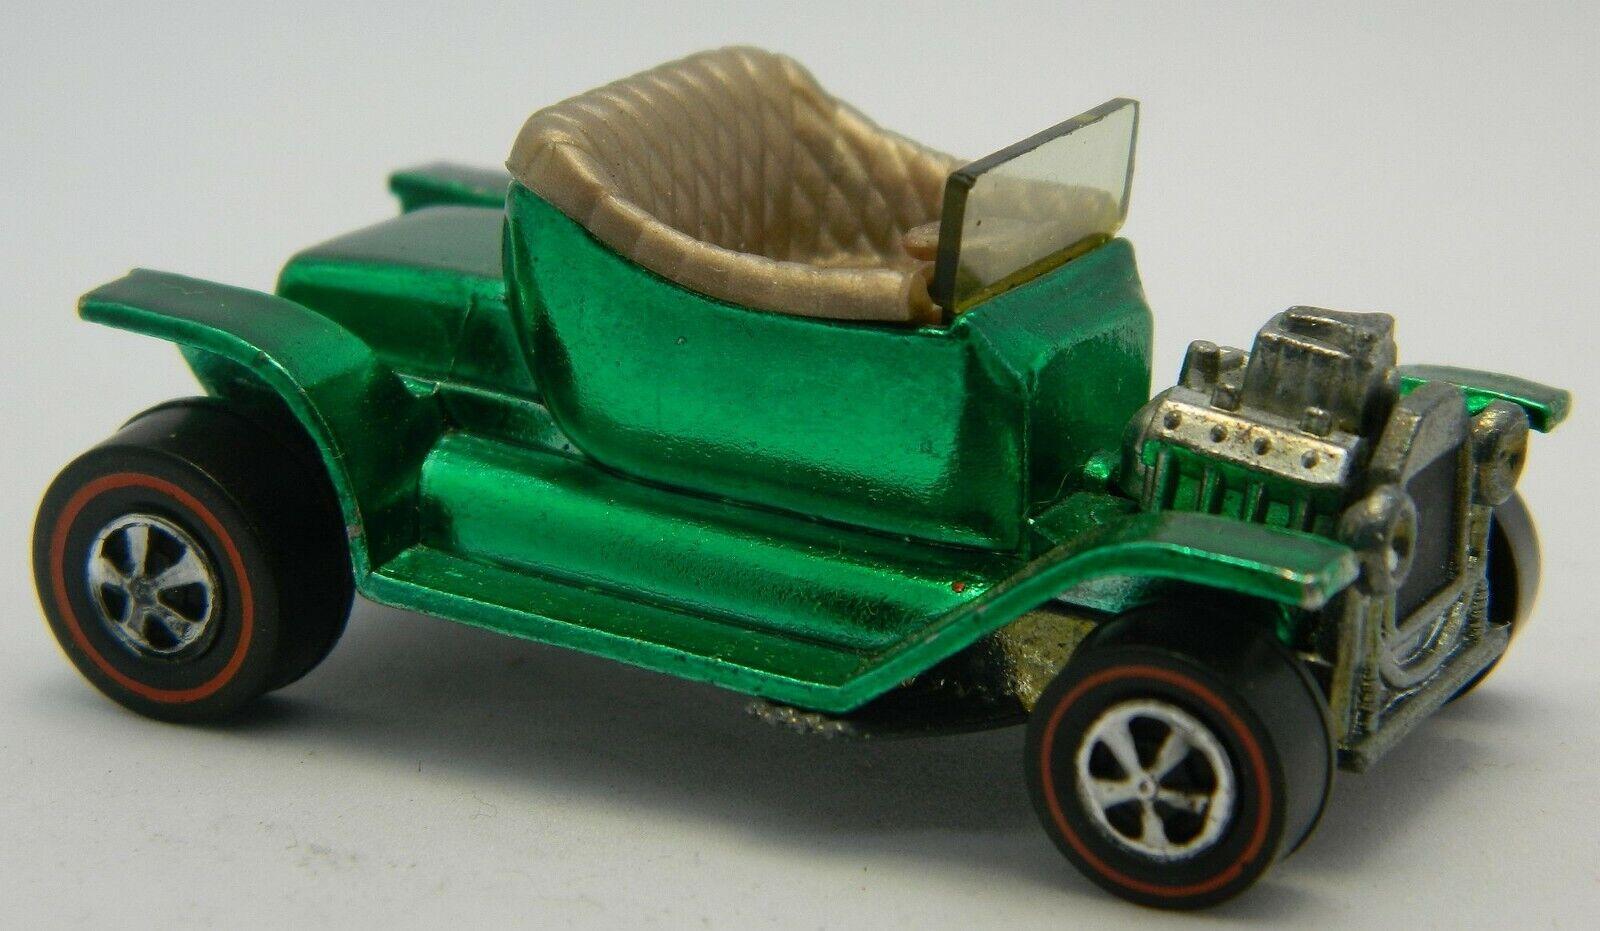 Hot Hot Hot Wheels Redline HOT HEAP Spectraflame Metallic Green BIN Fast FREE Shipping  dfc6ad